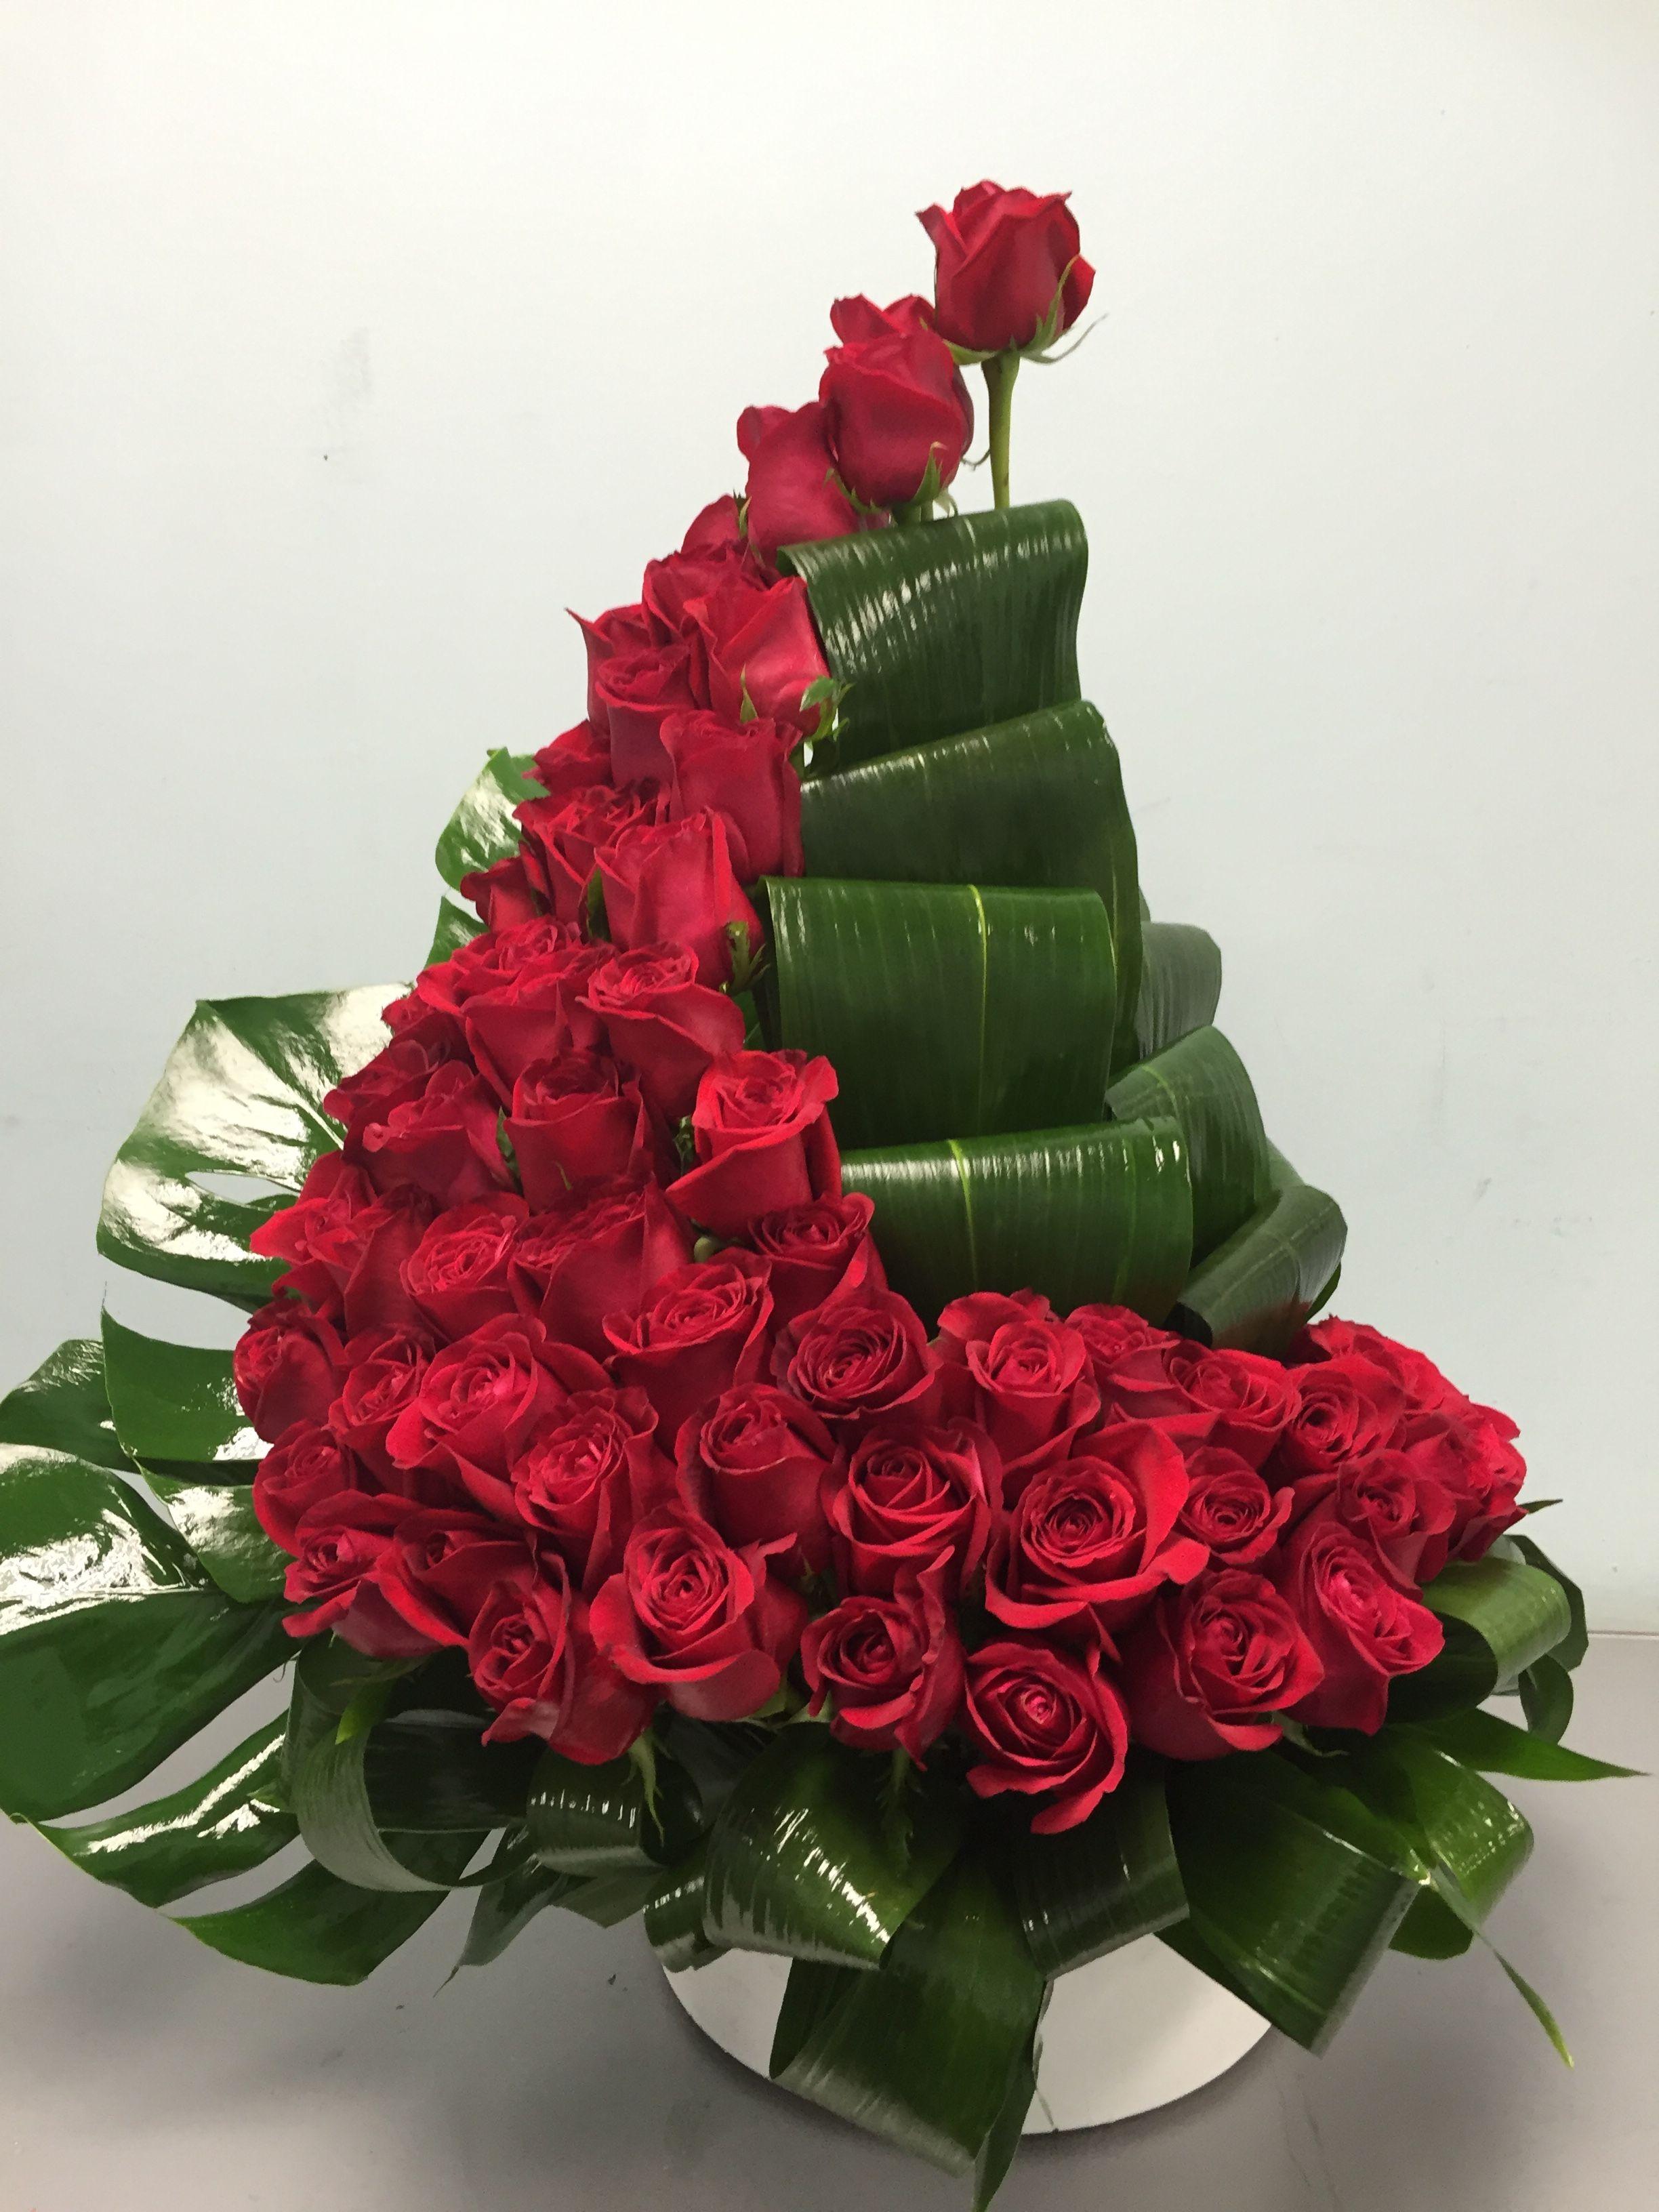 Exclusive Rose Design Red Rose Arrangements Fresh Flowers Arrangements Large Flower Arrangements